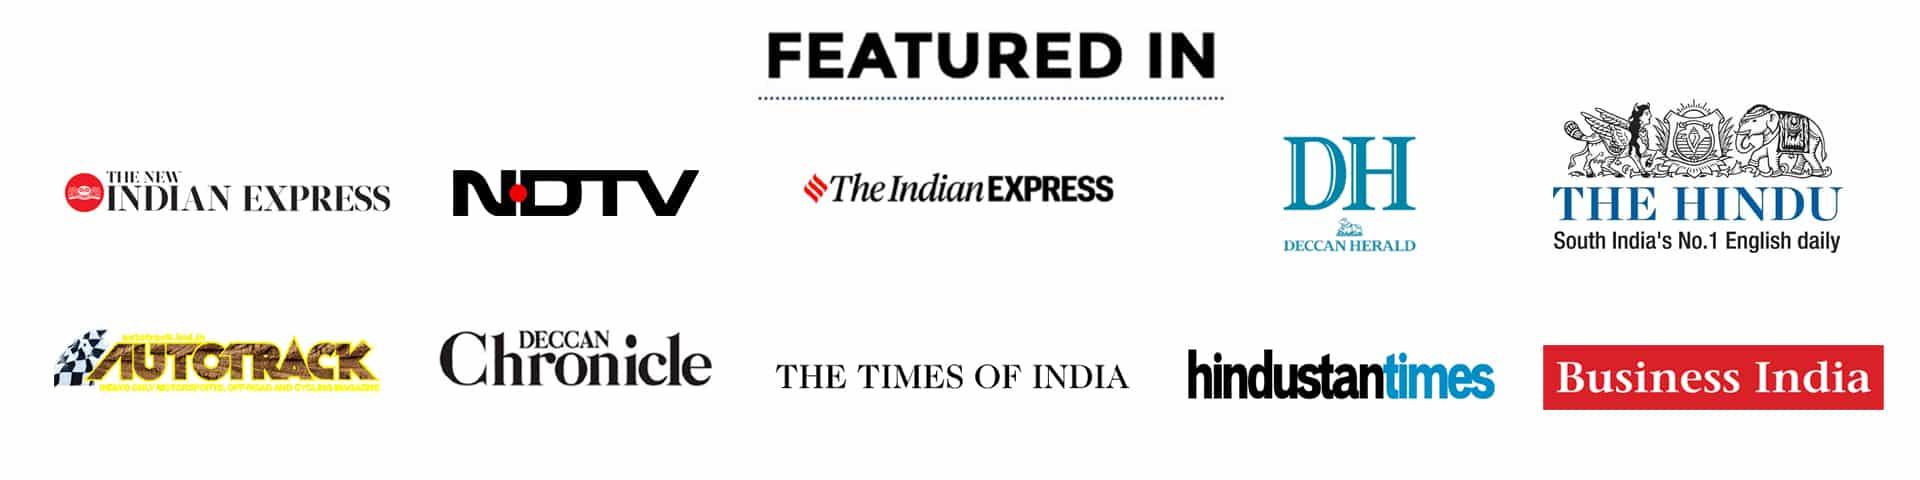 ICATT Air Ambulance services media point, Best Medical emergency air ambulance services in India